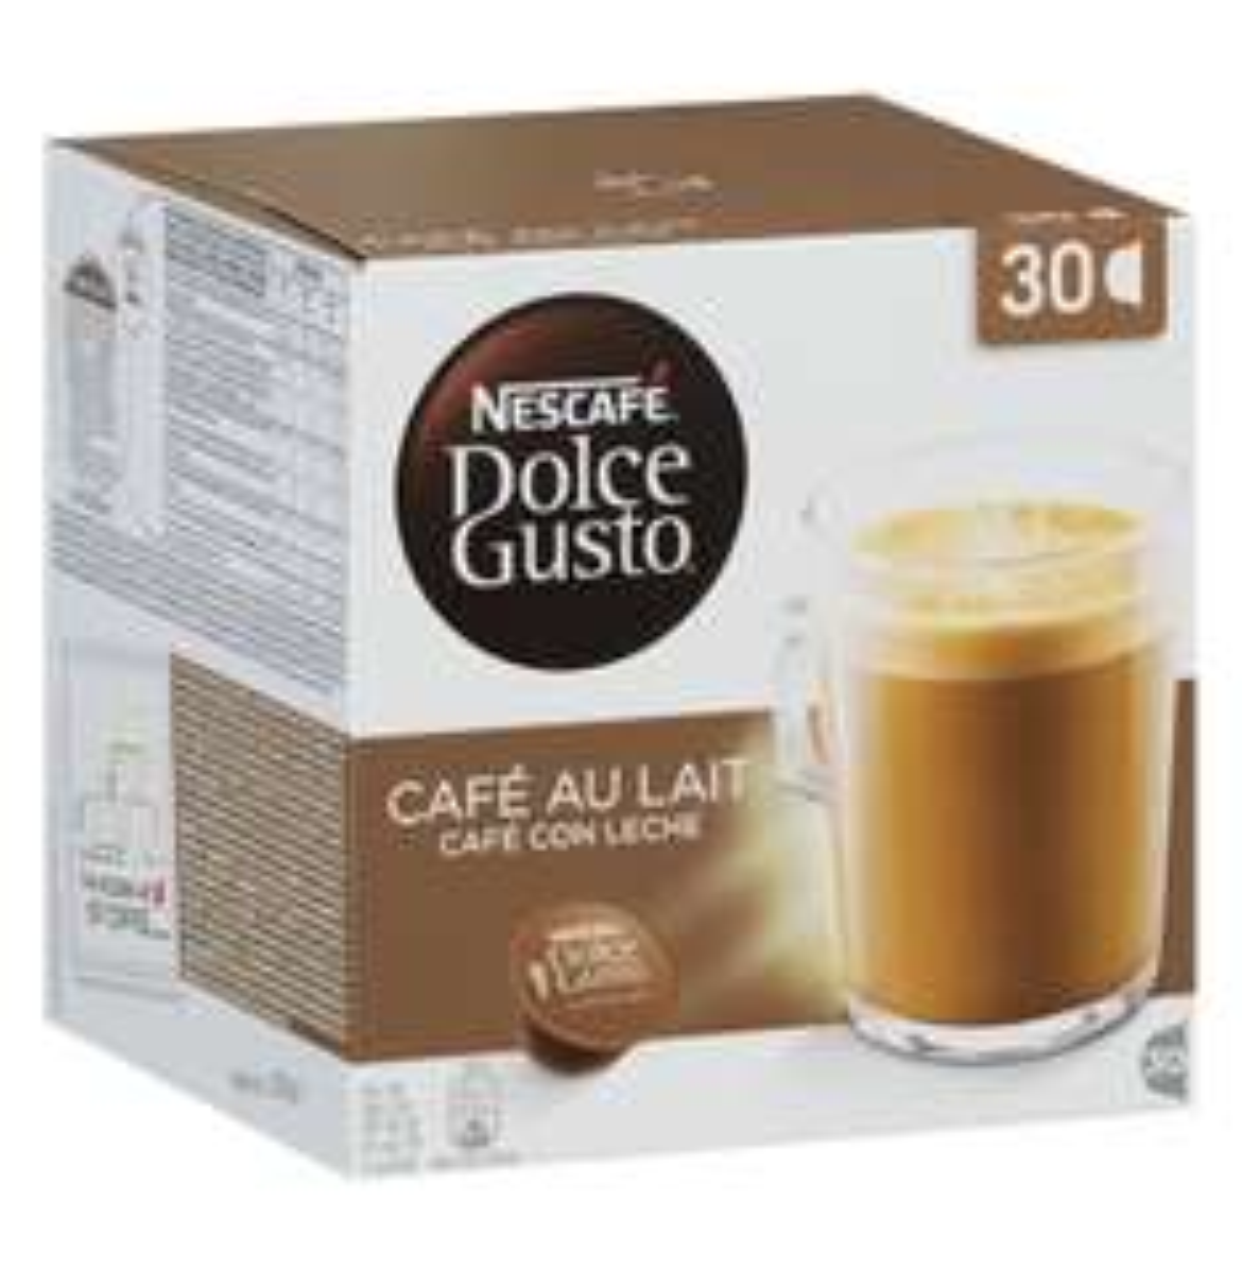 Amazon Nescafé Dolce Gusto Vorratsbox  90 Kapseln um 18,99 € ( Preisvergleich ab 28,98 € )